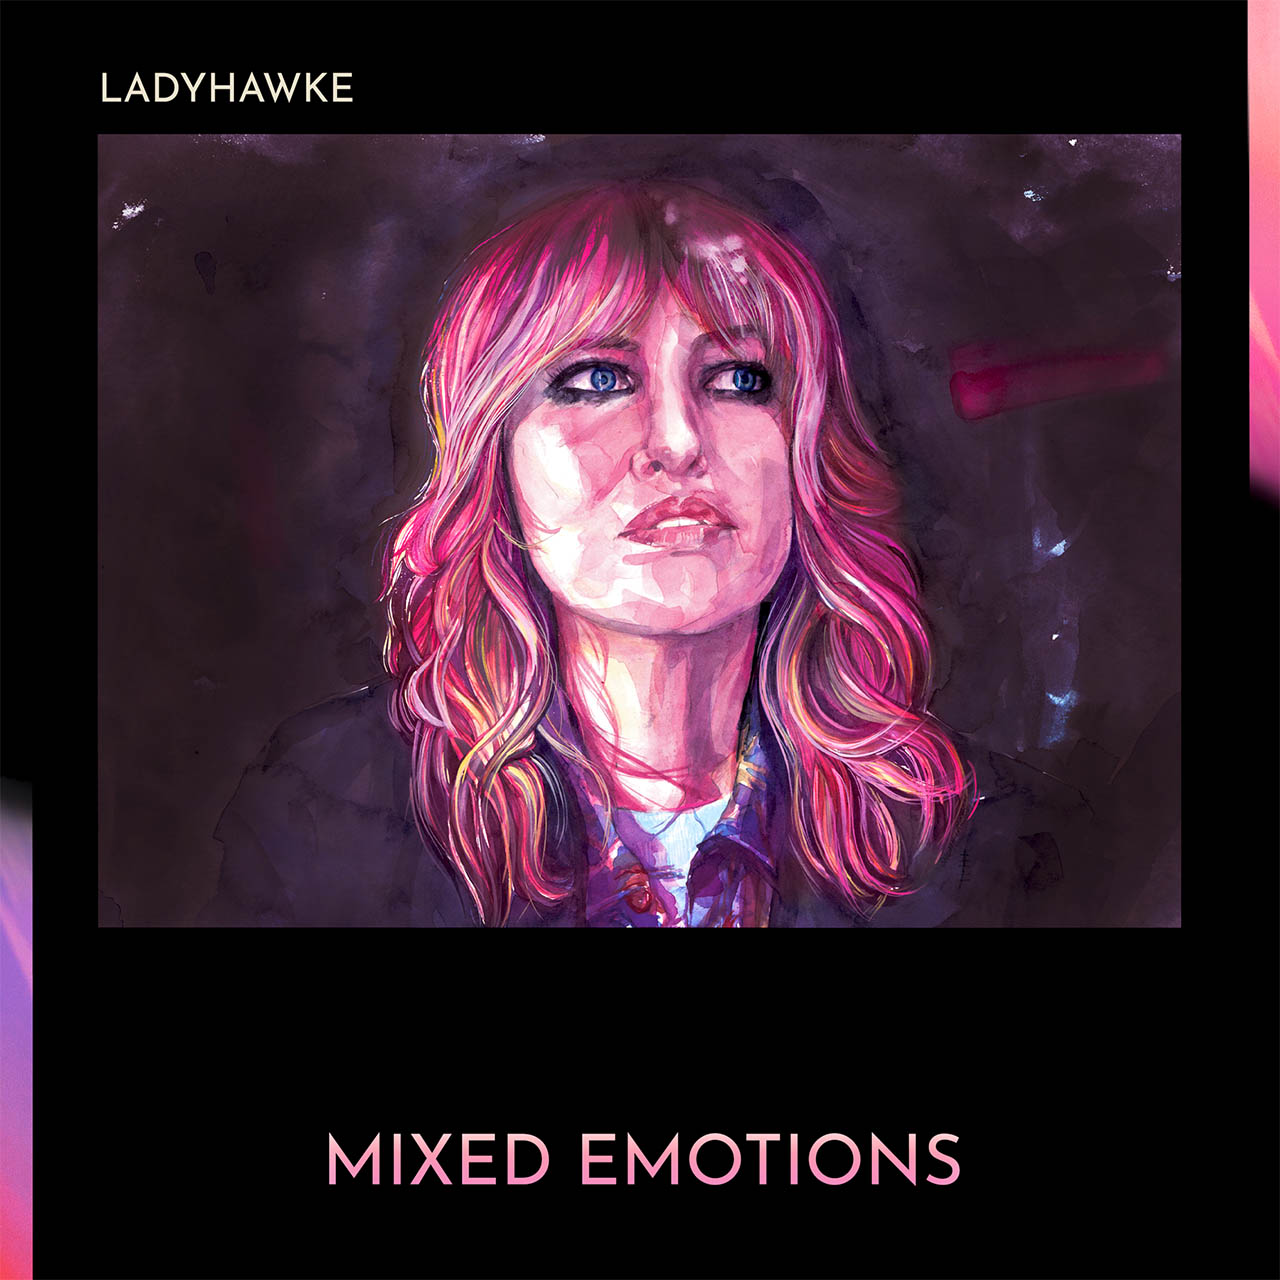 LADYHAWKE MIXED EMOTIONS